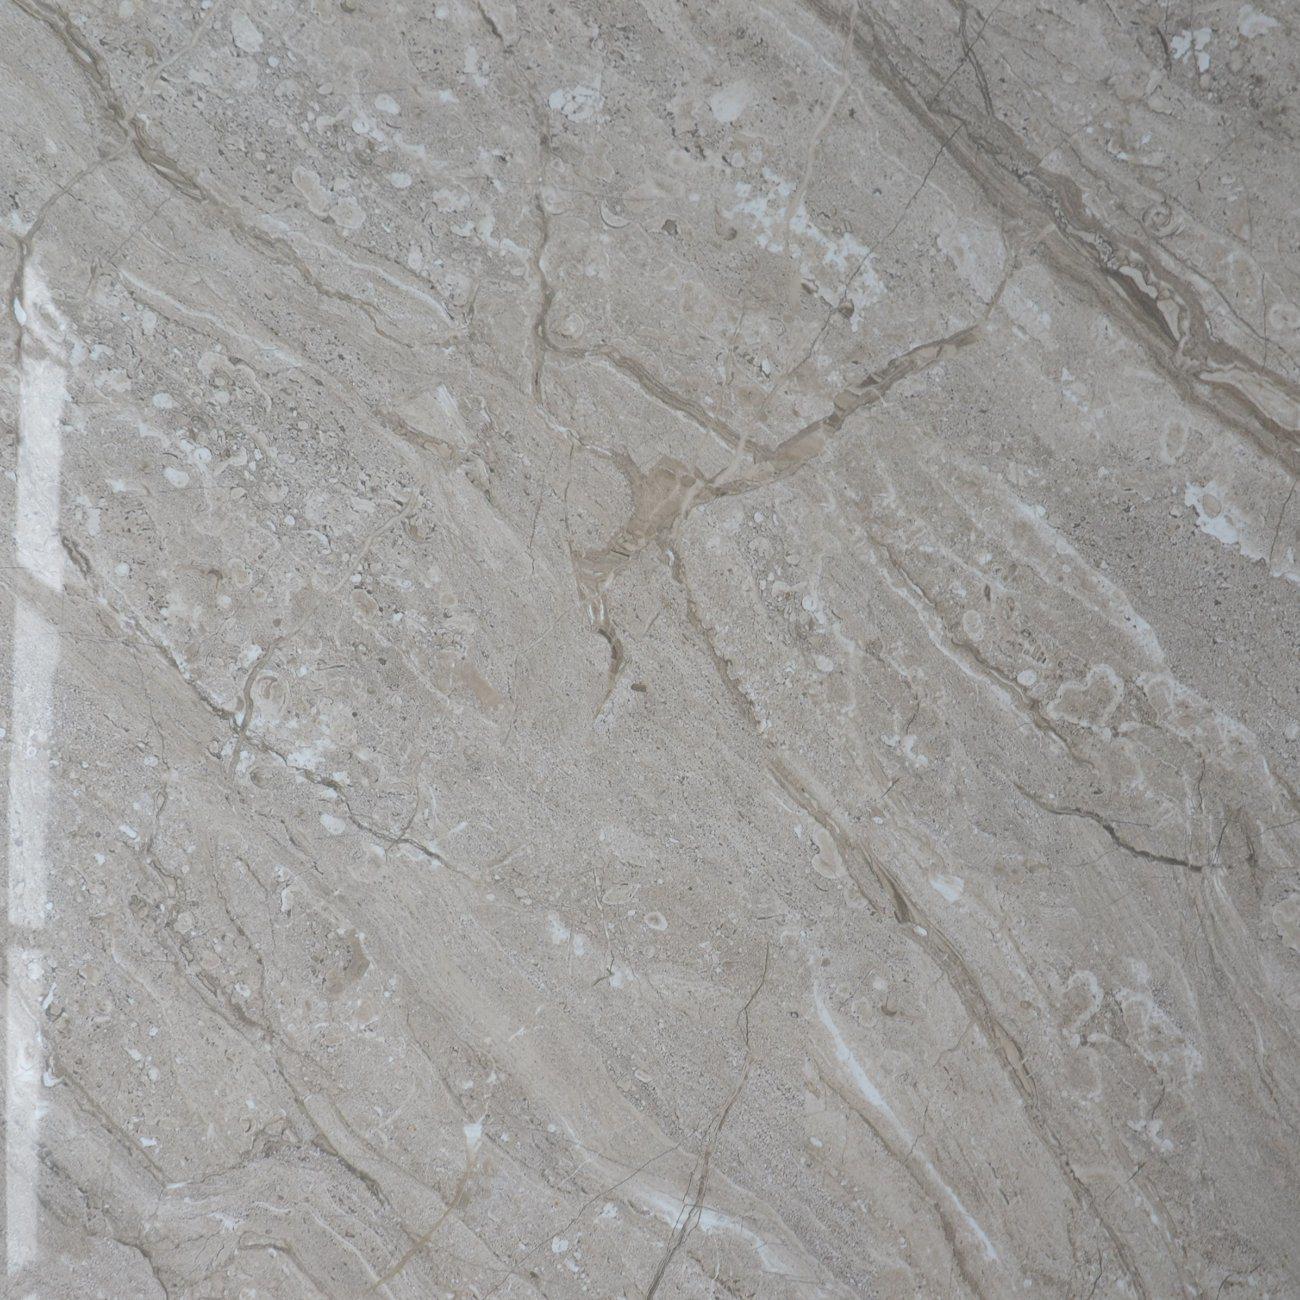 China hb6308 marbonite commercial kitchen interlocking ceramic tile china hb6308 marbonite commercial kitchen interlocking ceramic tile floors china polished ceramic tile varmora tiles dailygadgetfo Gallery